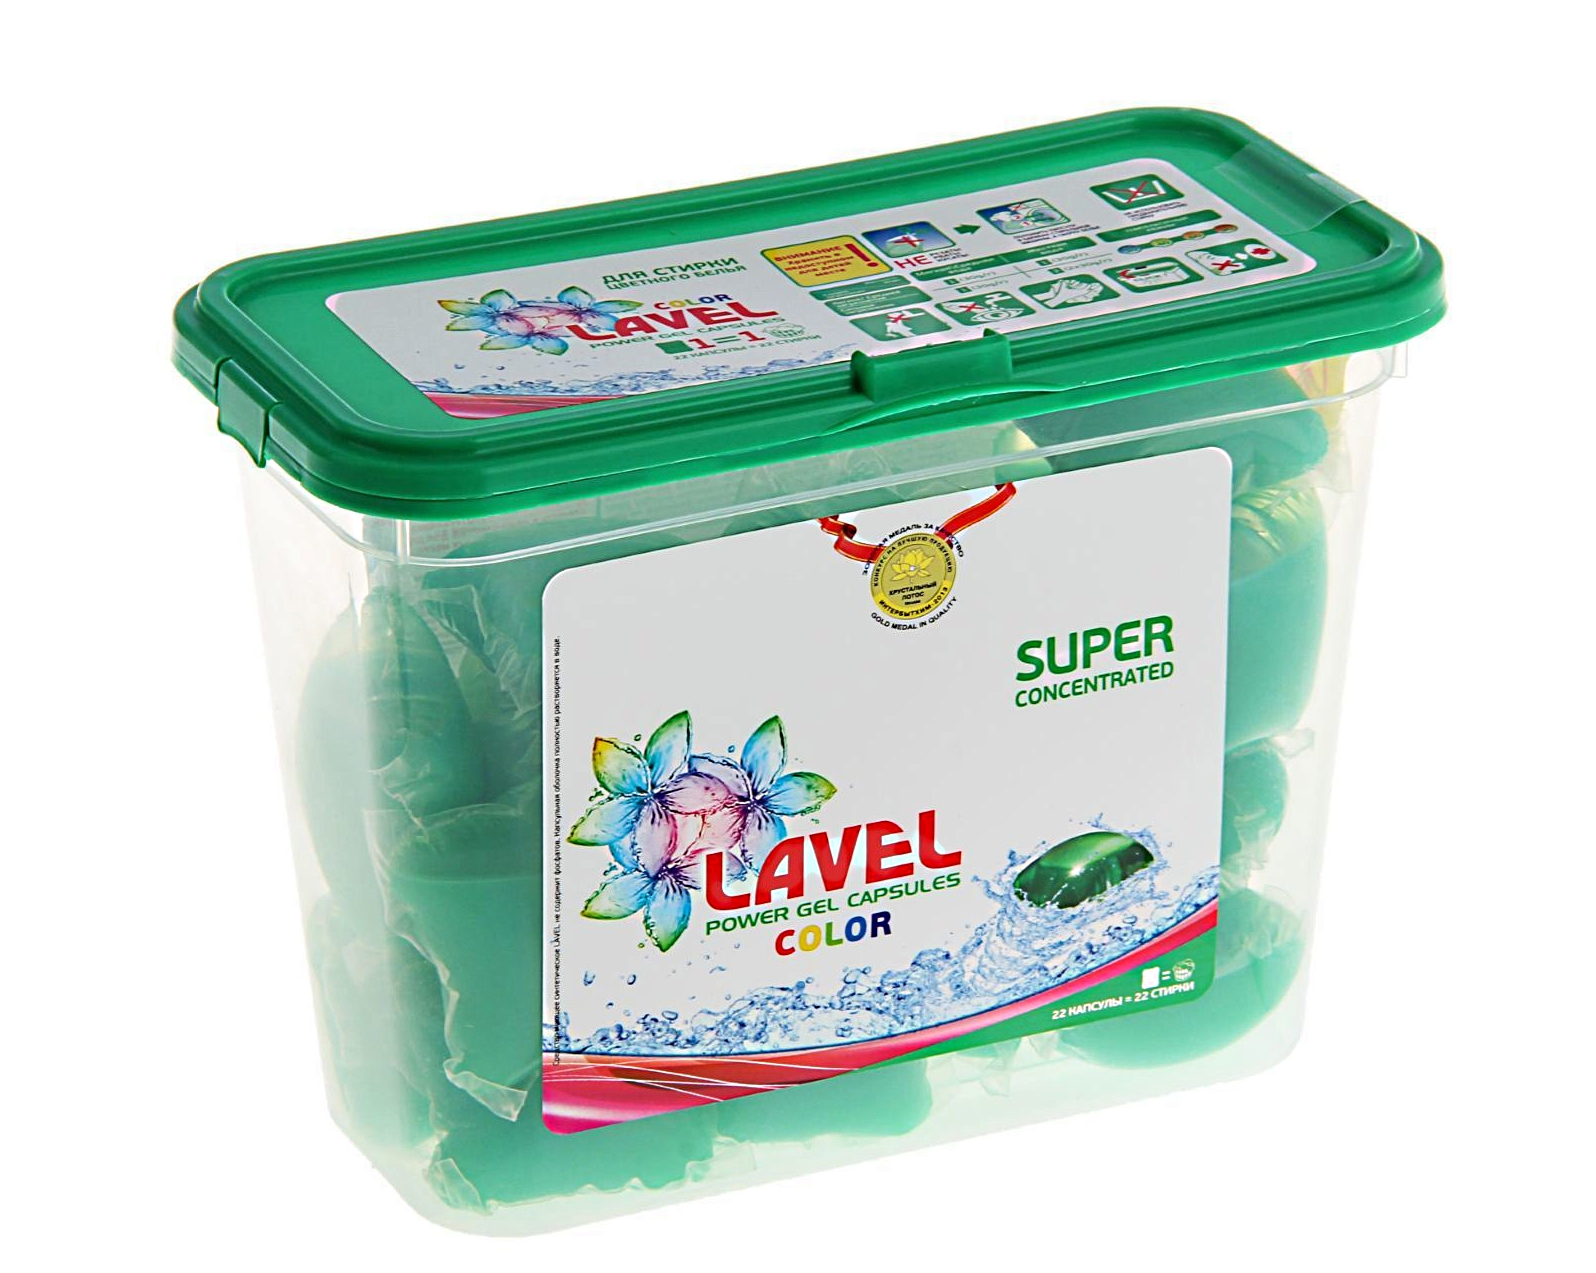 капсулы для стирки Lavel Power Gel Capsules Color